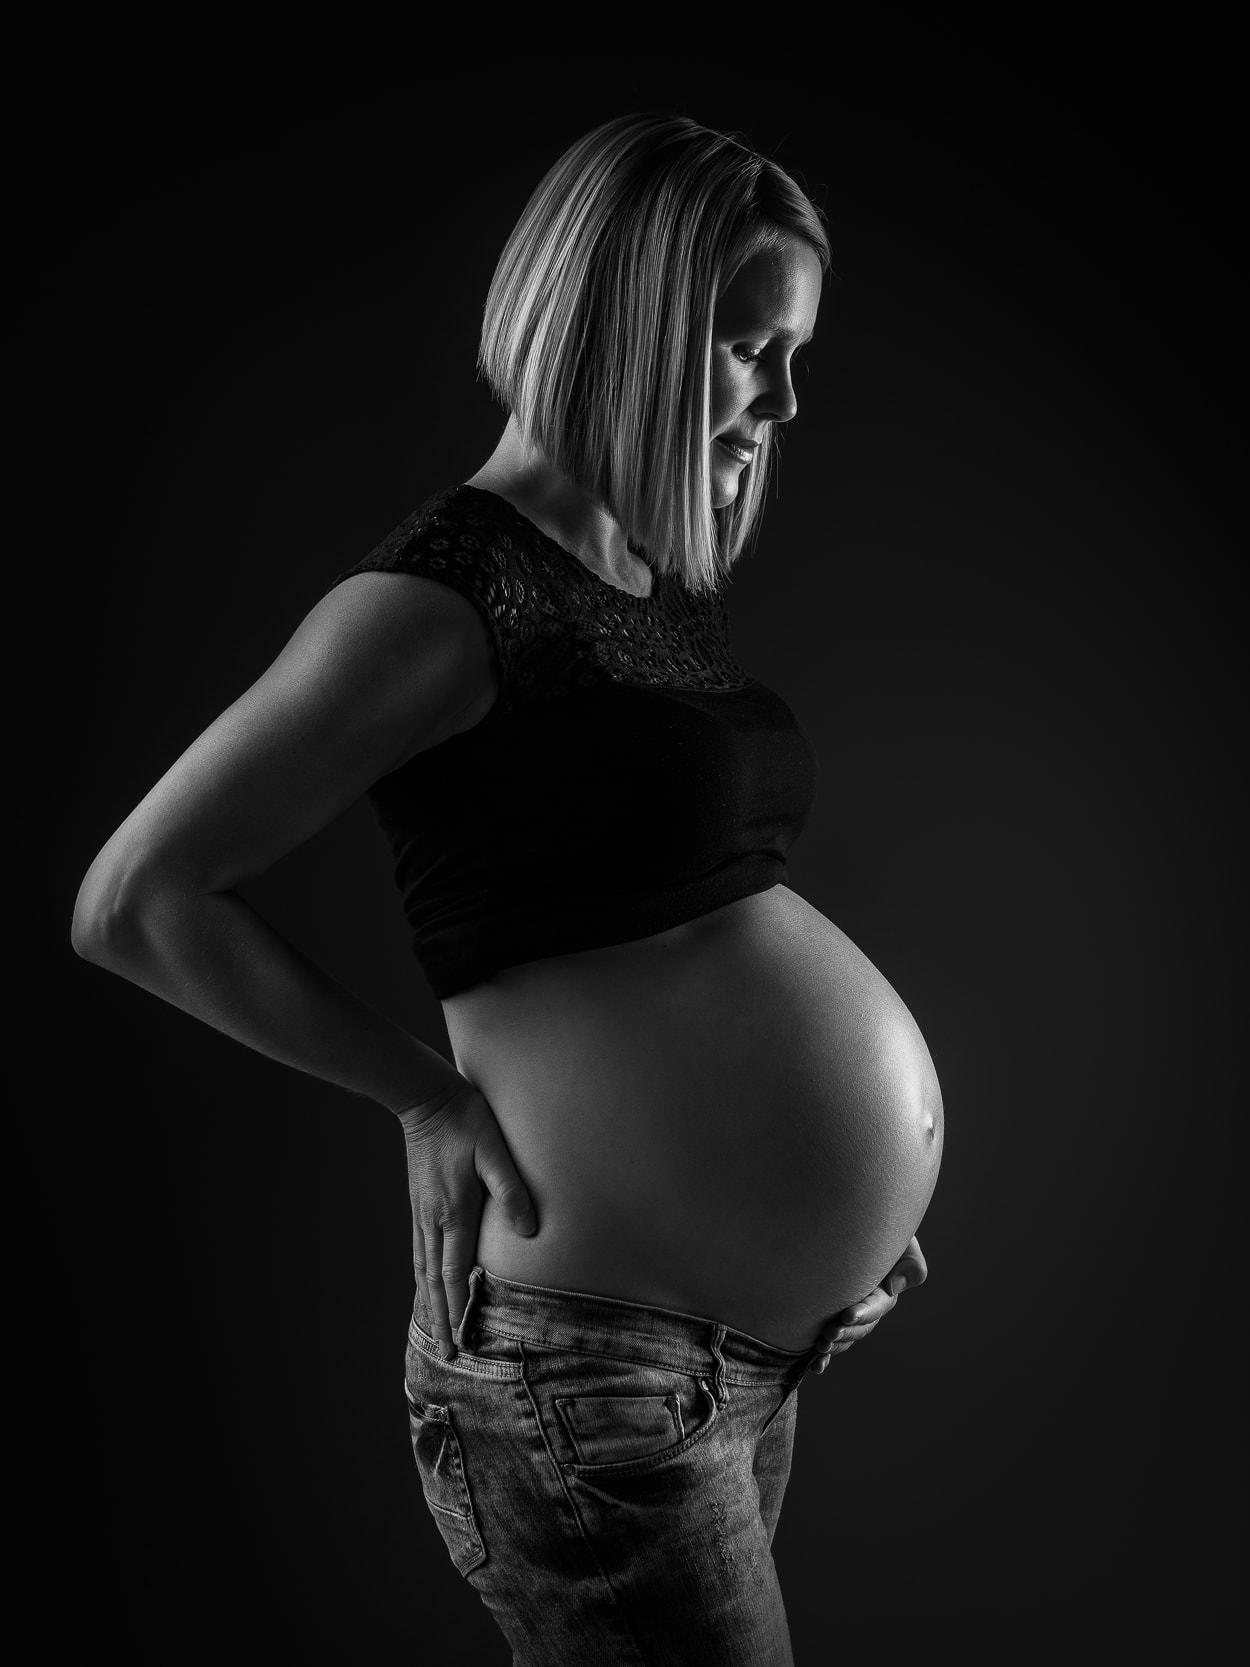 Zwangerschapsfotoshoot in studio arnhem dikke buik fotografie 012